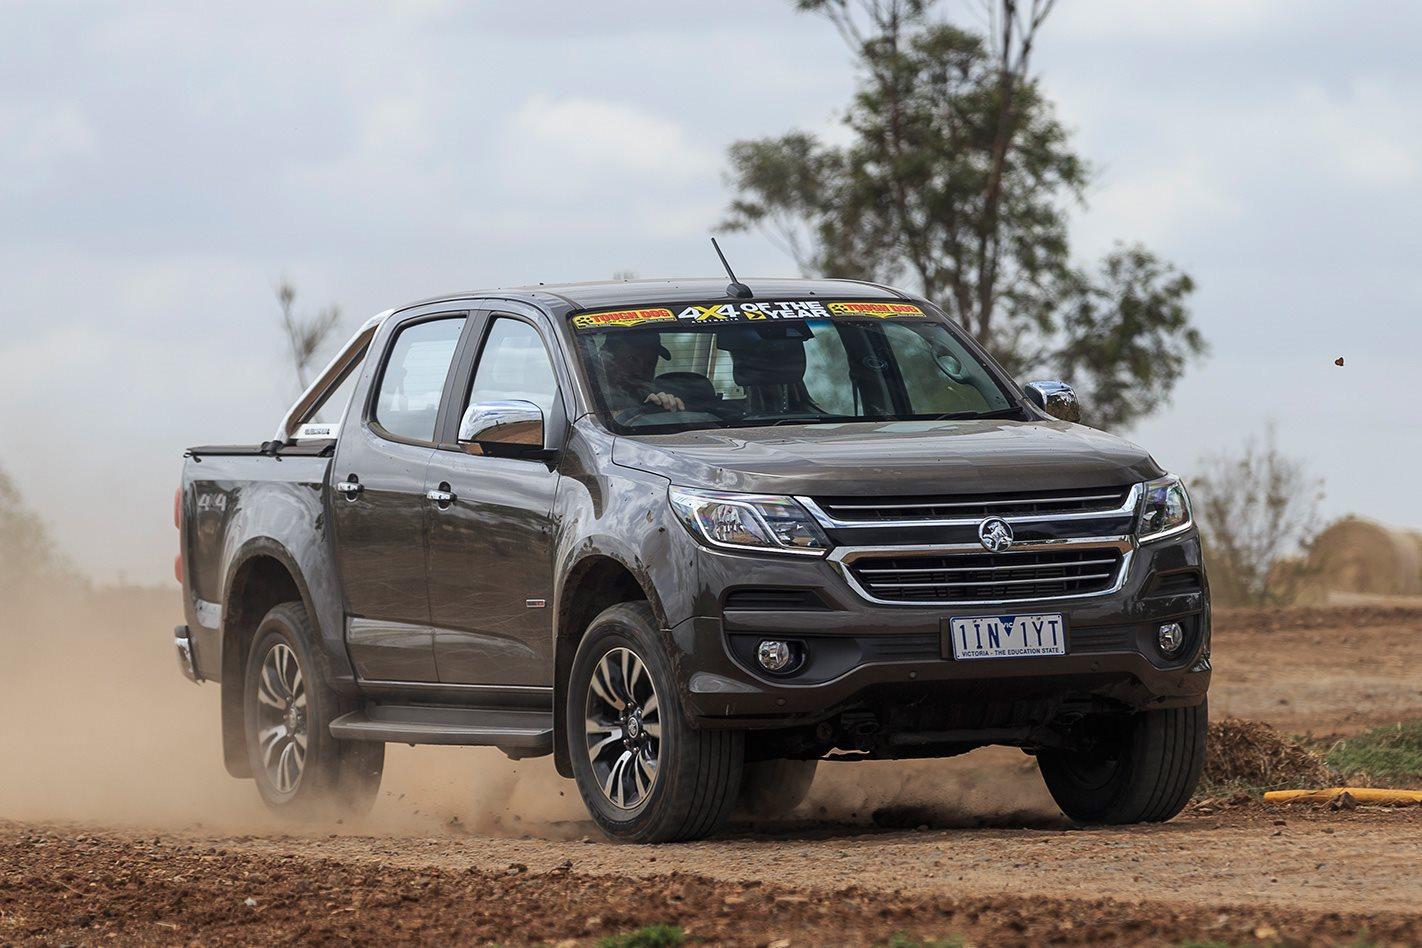 2017 4x4 Of The Year Finalist Holden Colorado 4x4 Australia